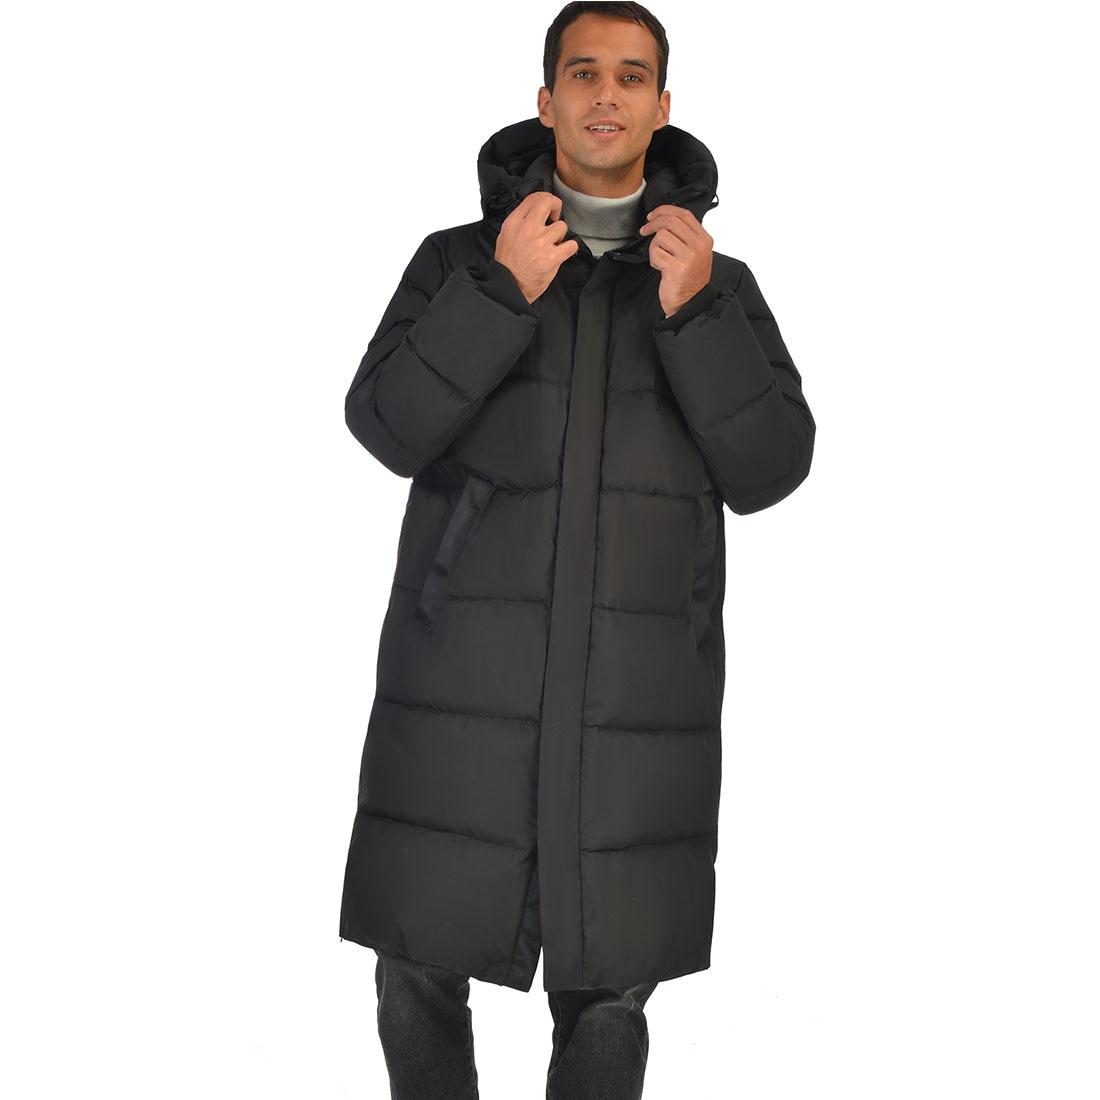 Mens Long Down Jacket Coat Winter Lesmart Warm Padded Thicken Hooded Windbreaker High Quality Down Parka Overcoat